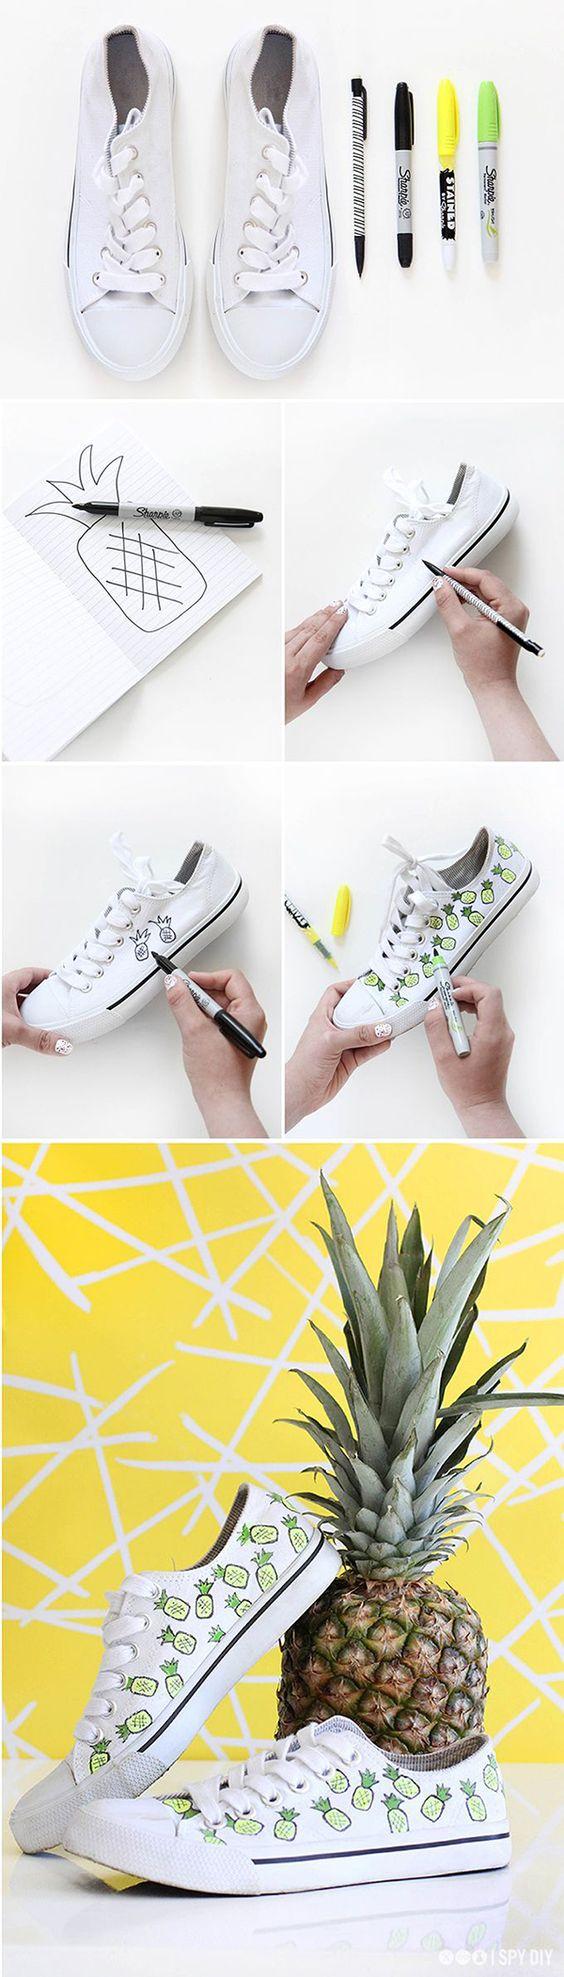 3380ca18176c3897ba14b2ab98273c6d - 5 leuke manieren om je sneakers (of turnpantoffels) te pimpen